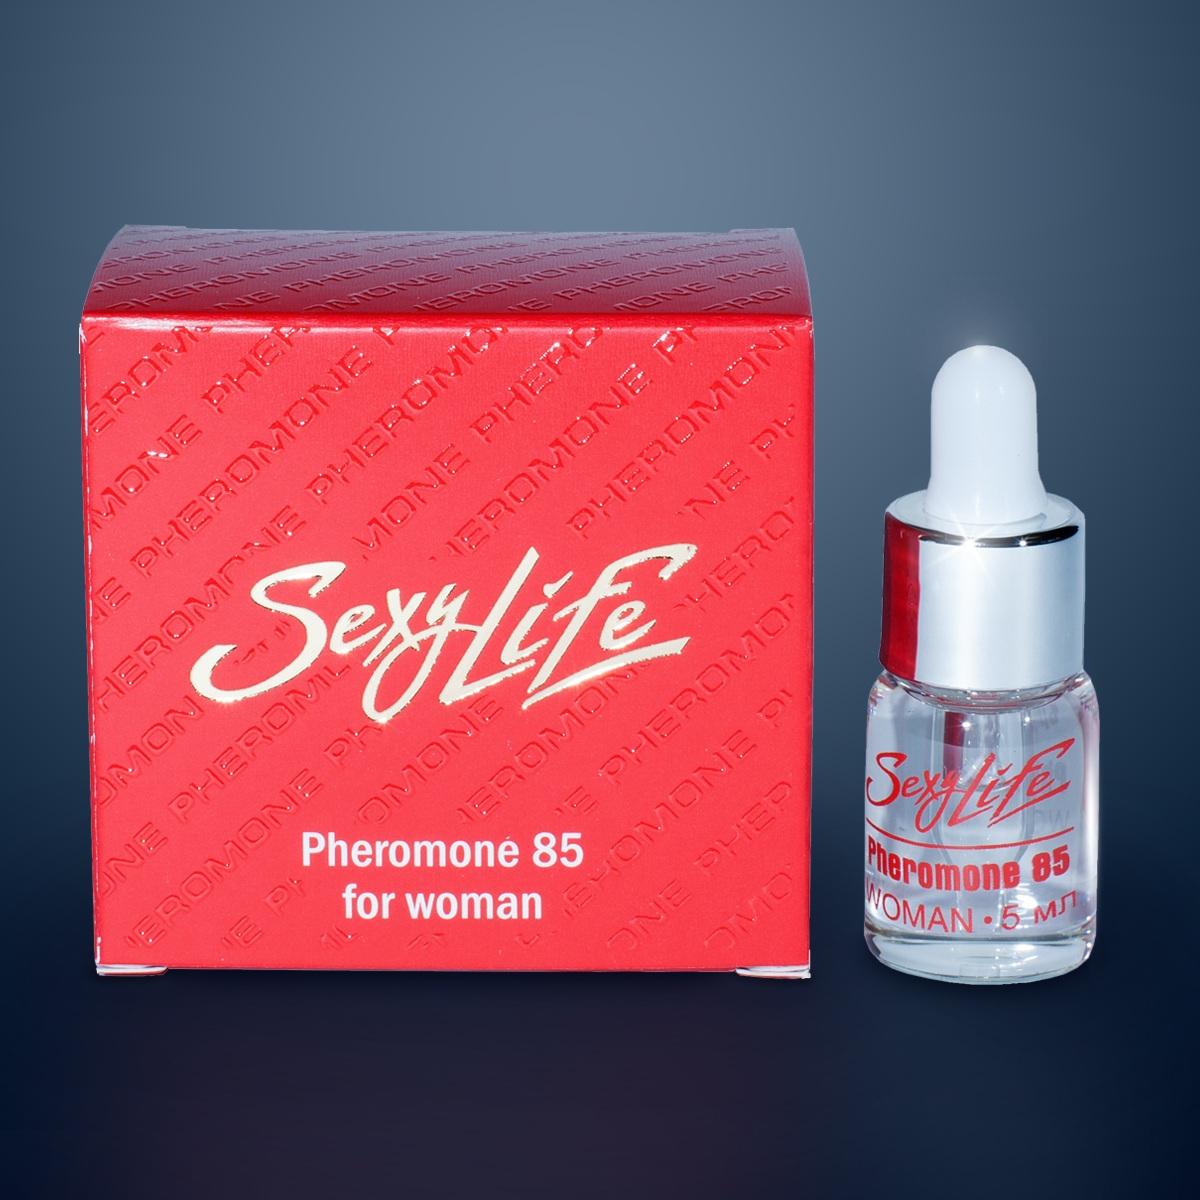 Концентрат феромонов Sexy Life для женщин (концентрация 85%) - 5 мл. - фото 84264